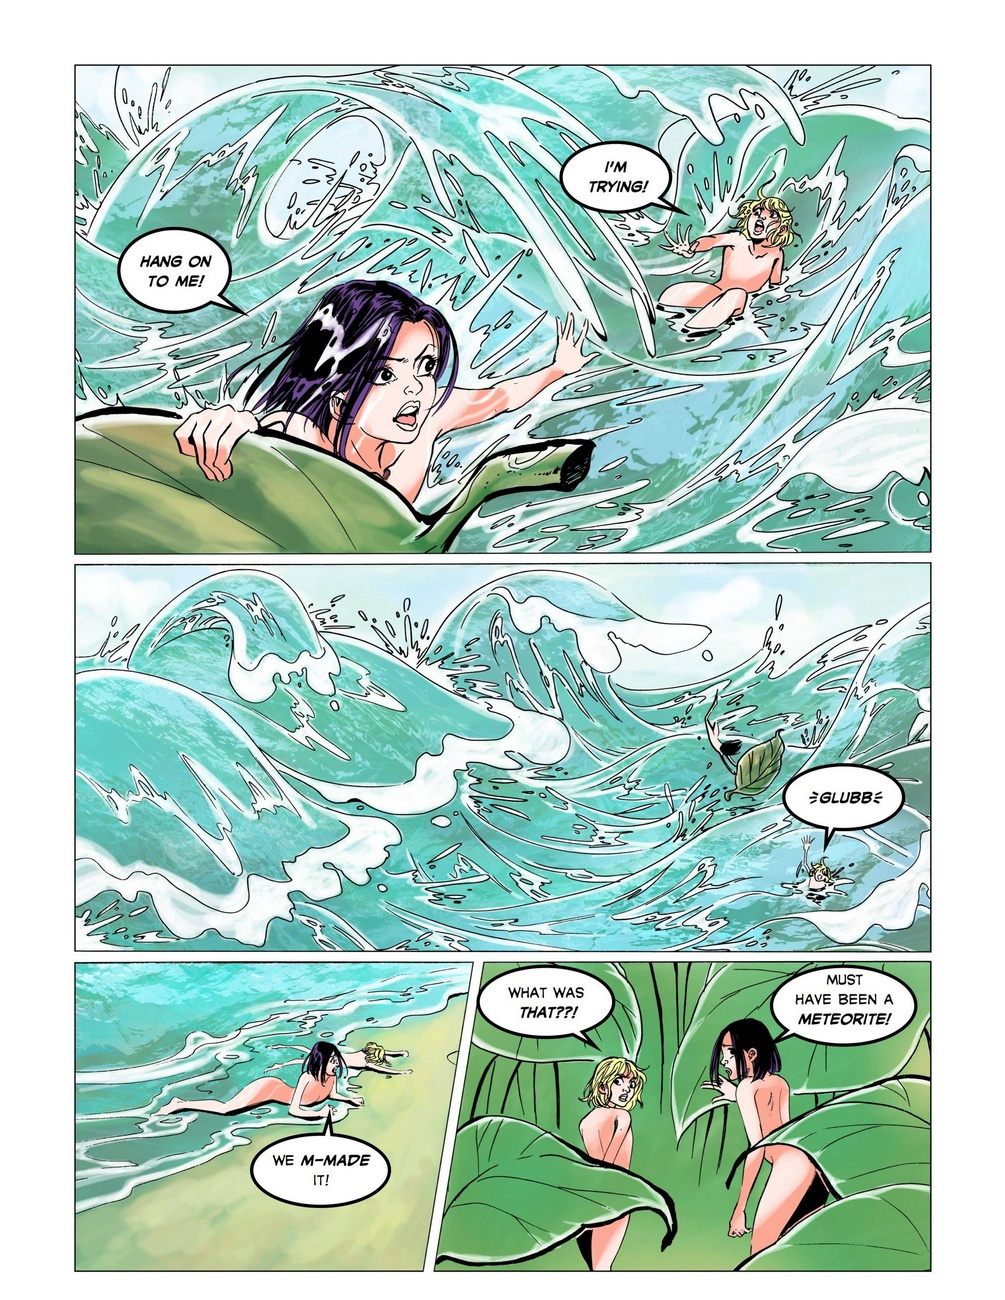 The Big Splash - part 2